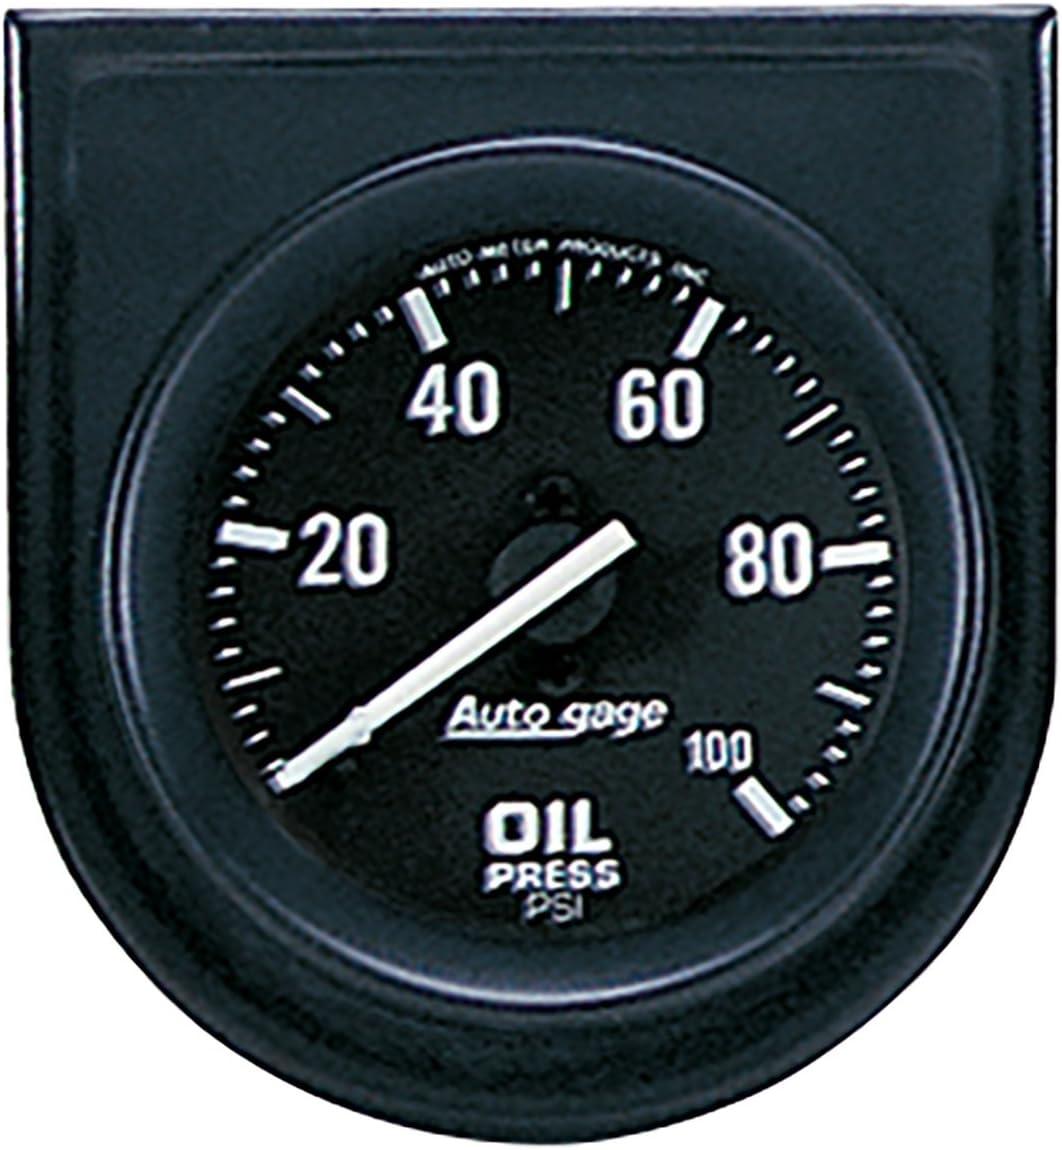 B0009SS6HC AUTO METER 2332 Autogage Oil Pressure Gauge Panel 71IhbSEEqiL